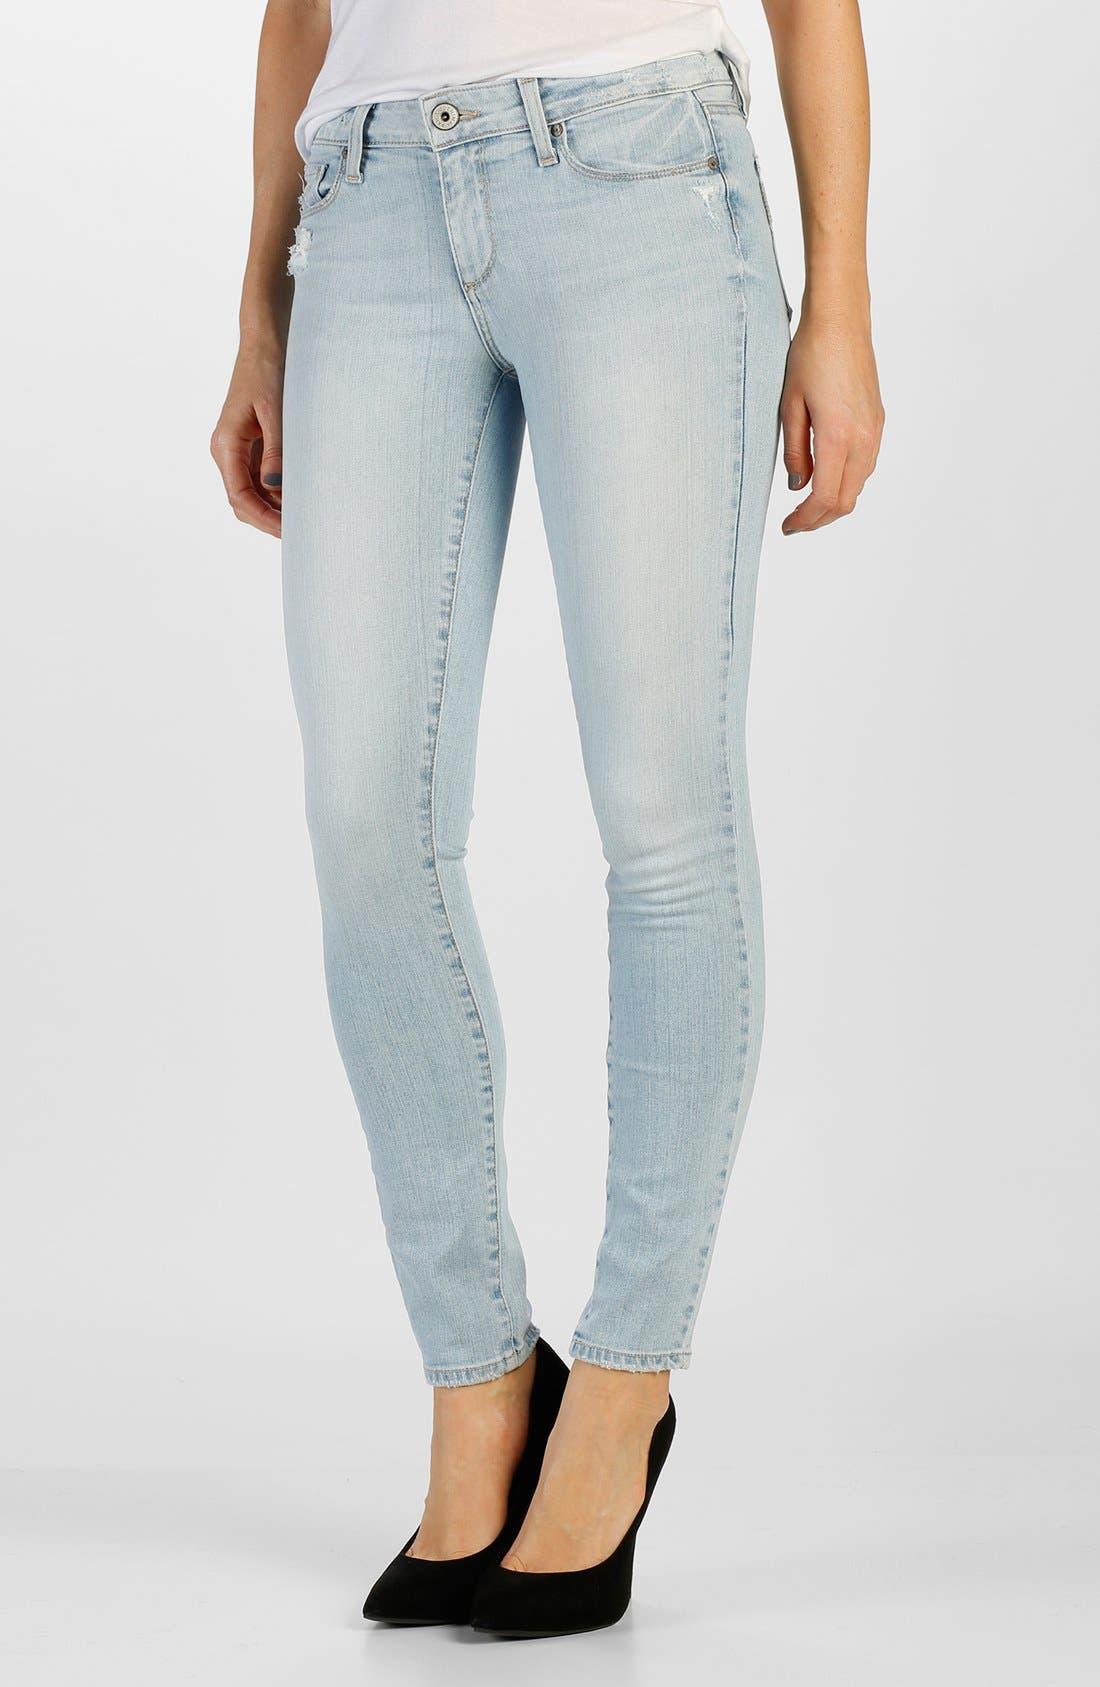 Main Image - Paige Denim 'Verdugo' Ultra Skinny Jeans (Harriet Destructed)